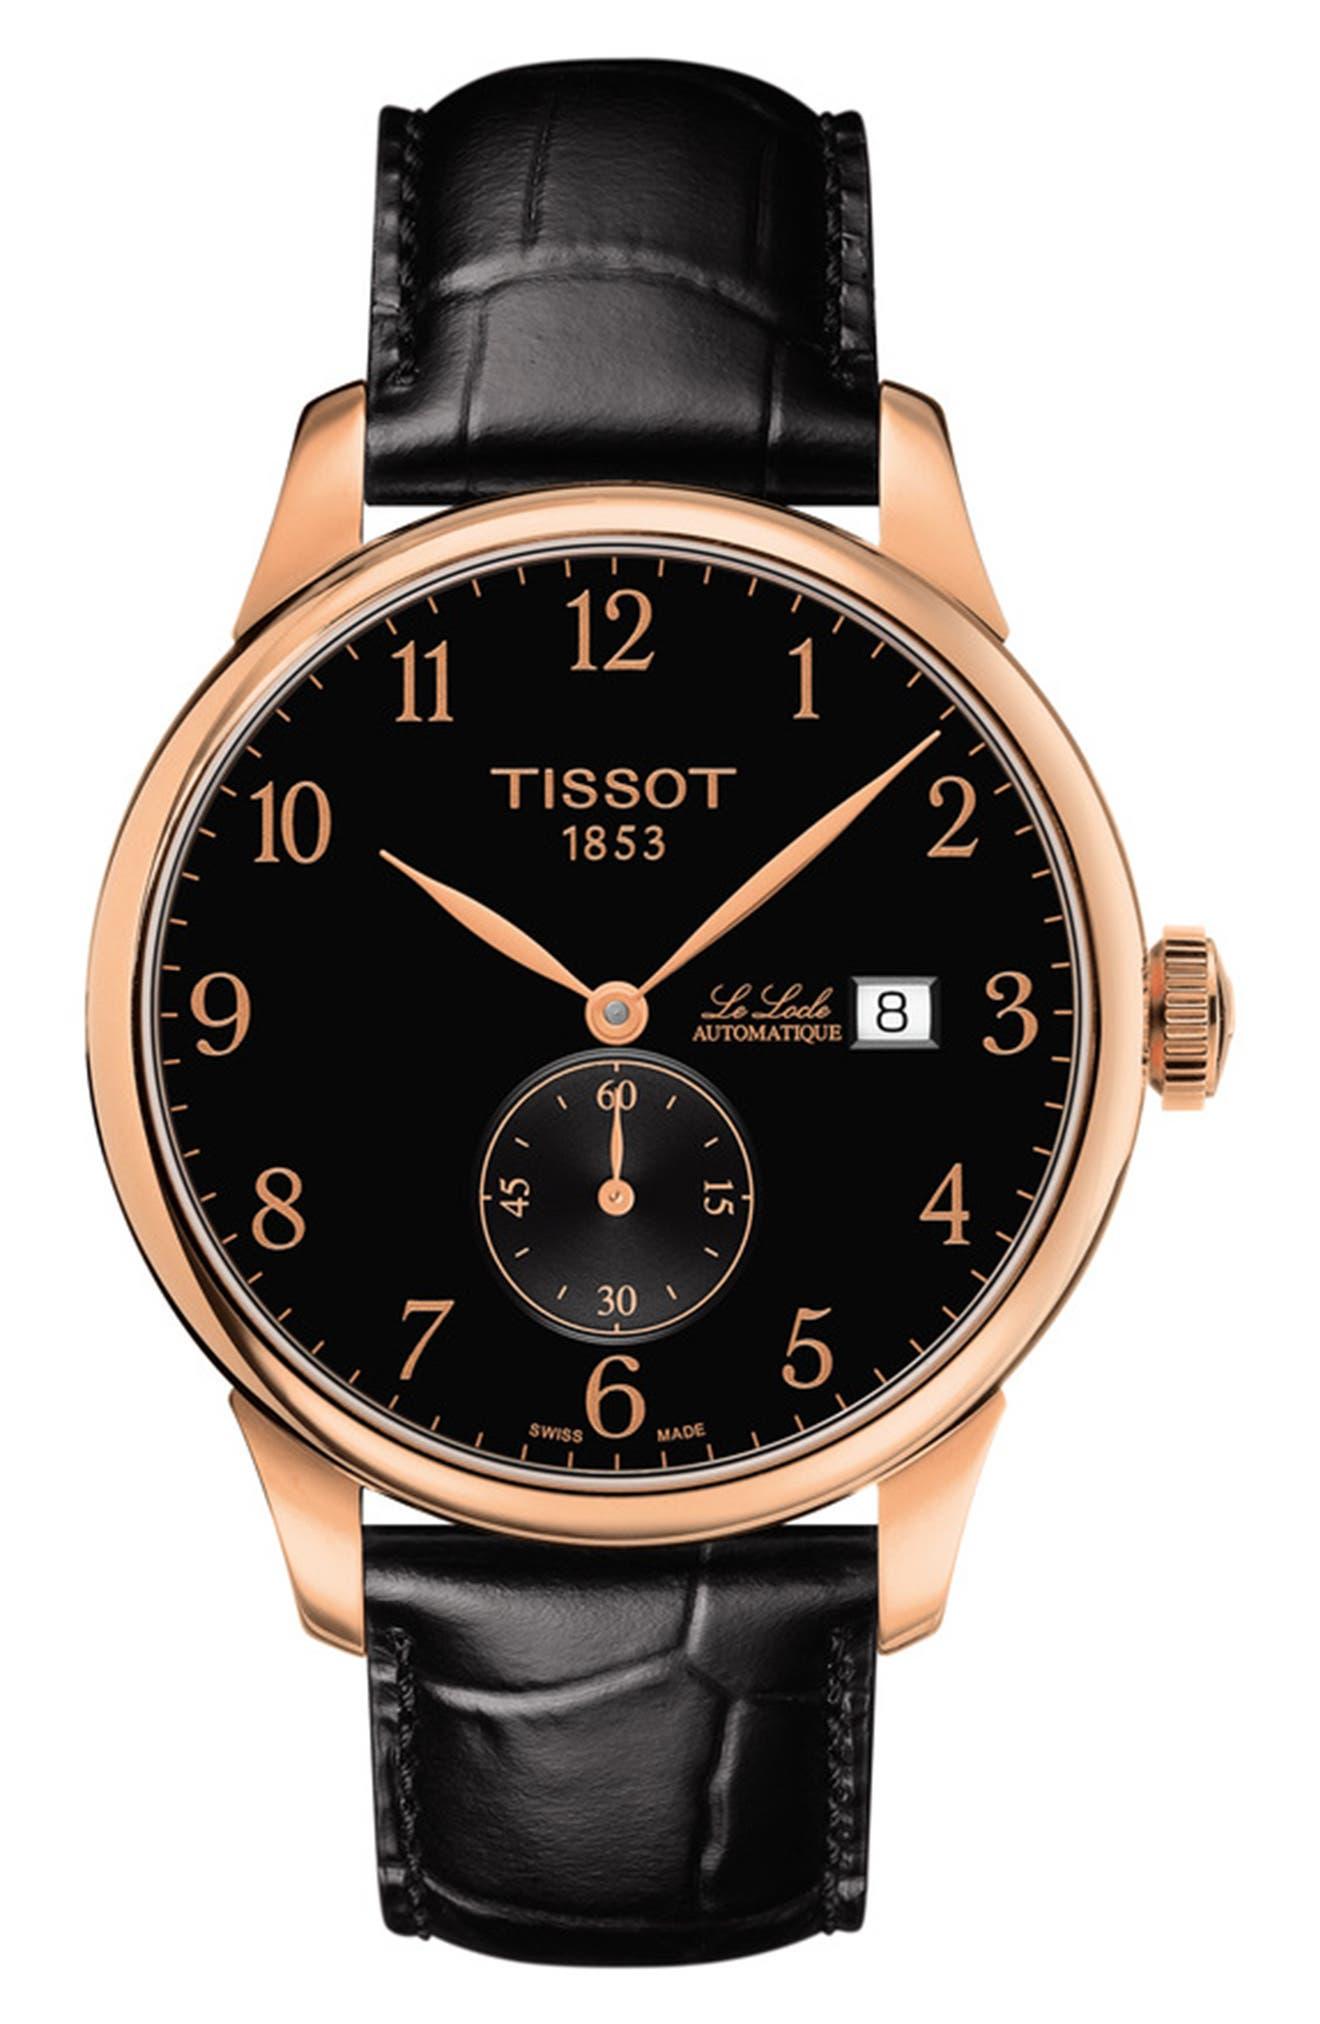 Tissot Men's Le Locle Automatique Petite Seconde Croc Embossed Leather Strap Watch In Black